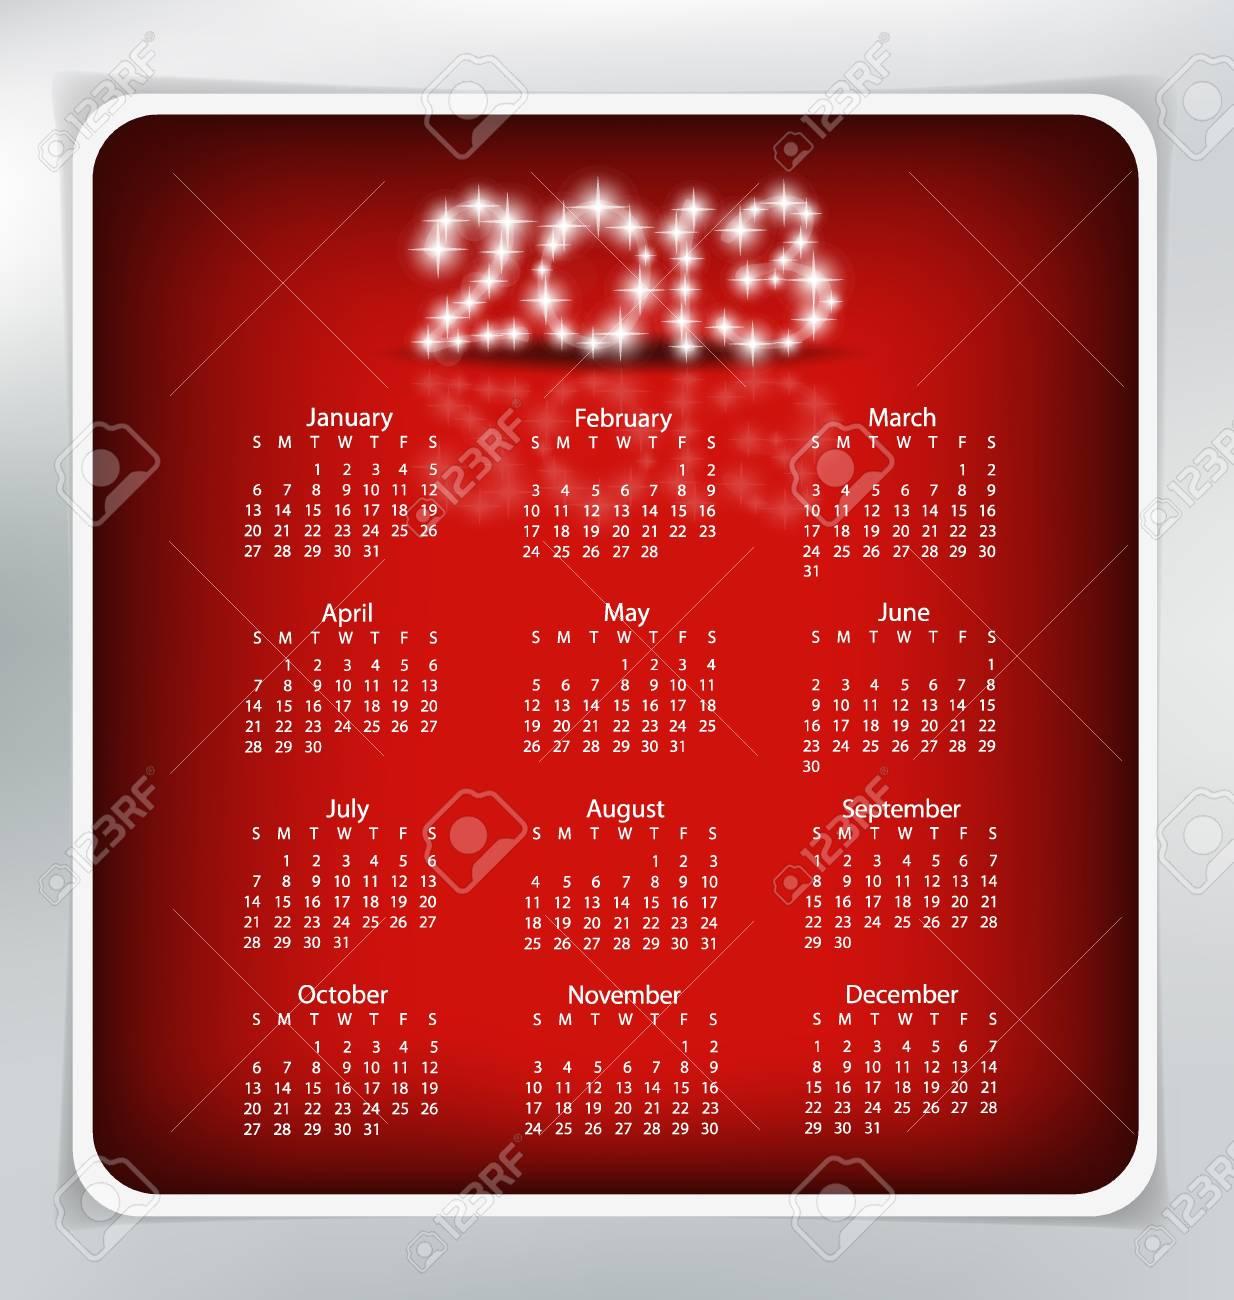 Simple 2013 year calendar. Stock Vector - 17101802